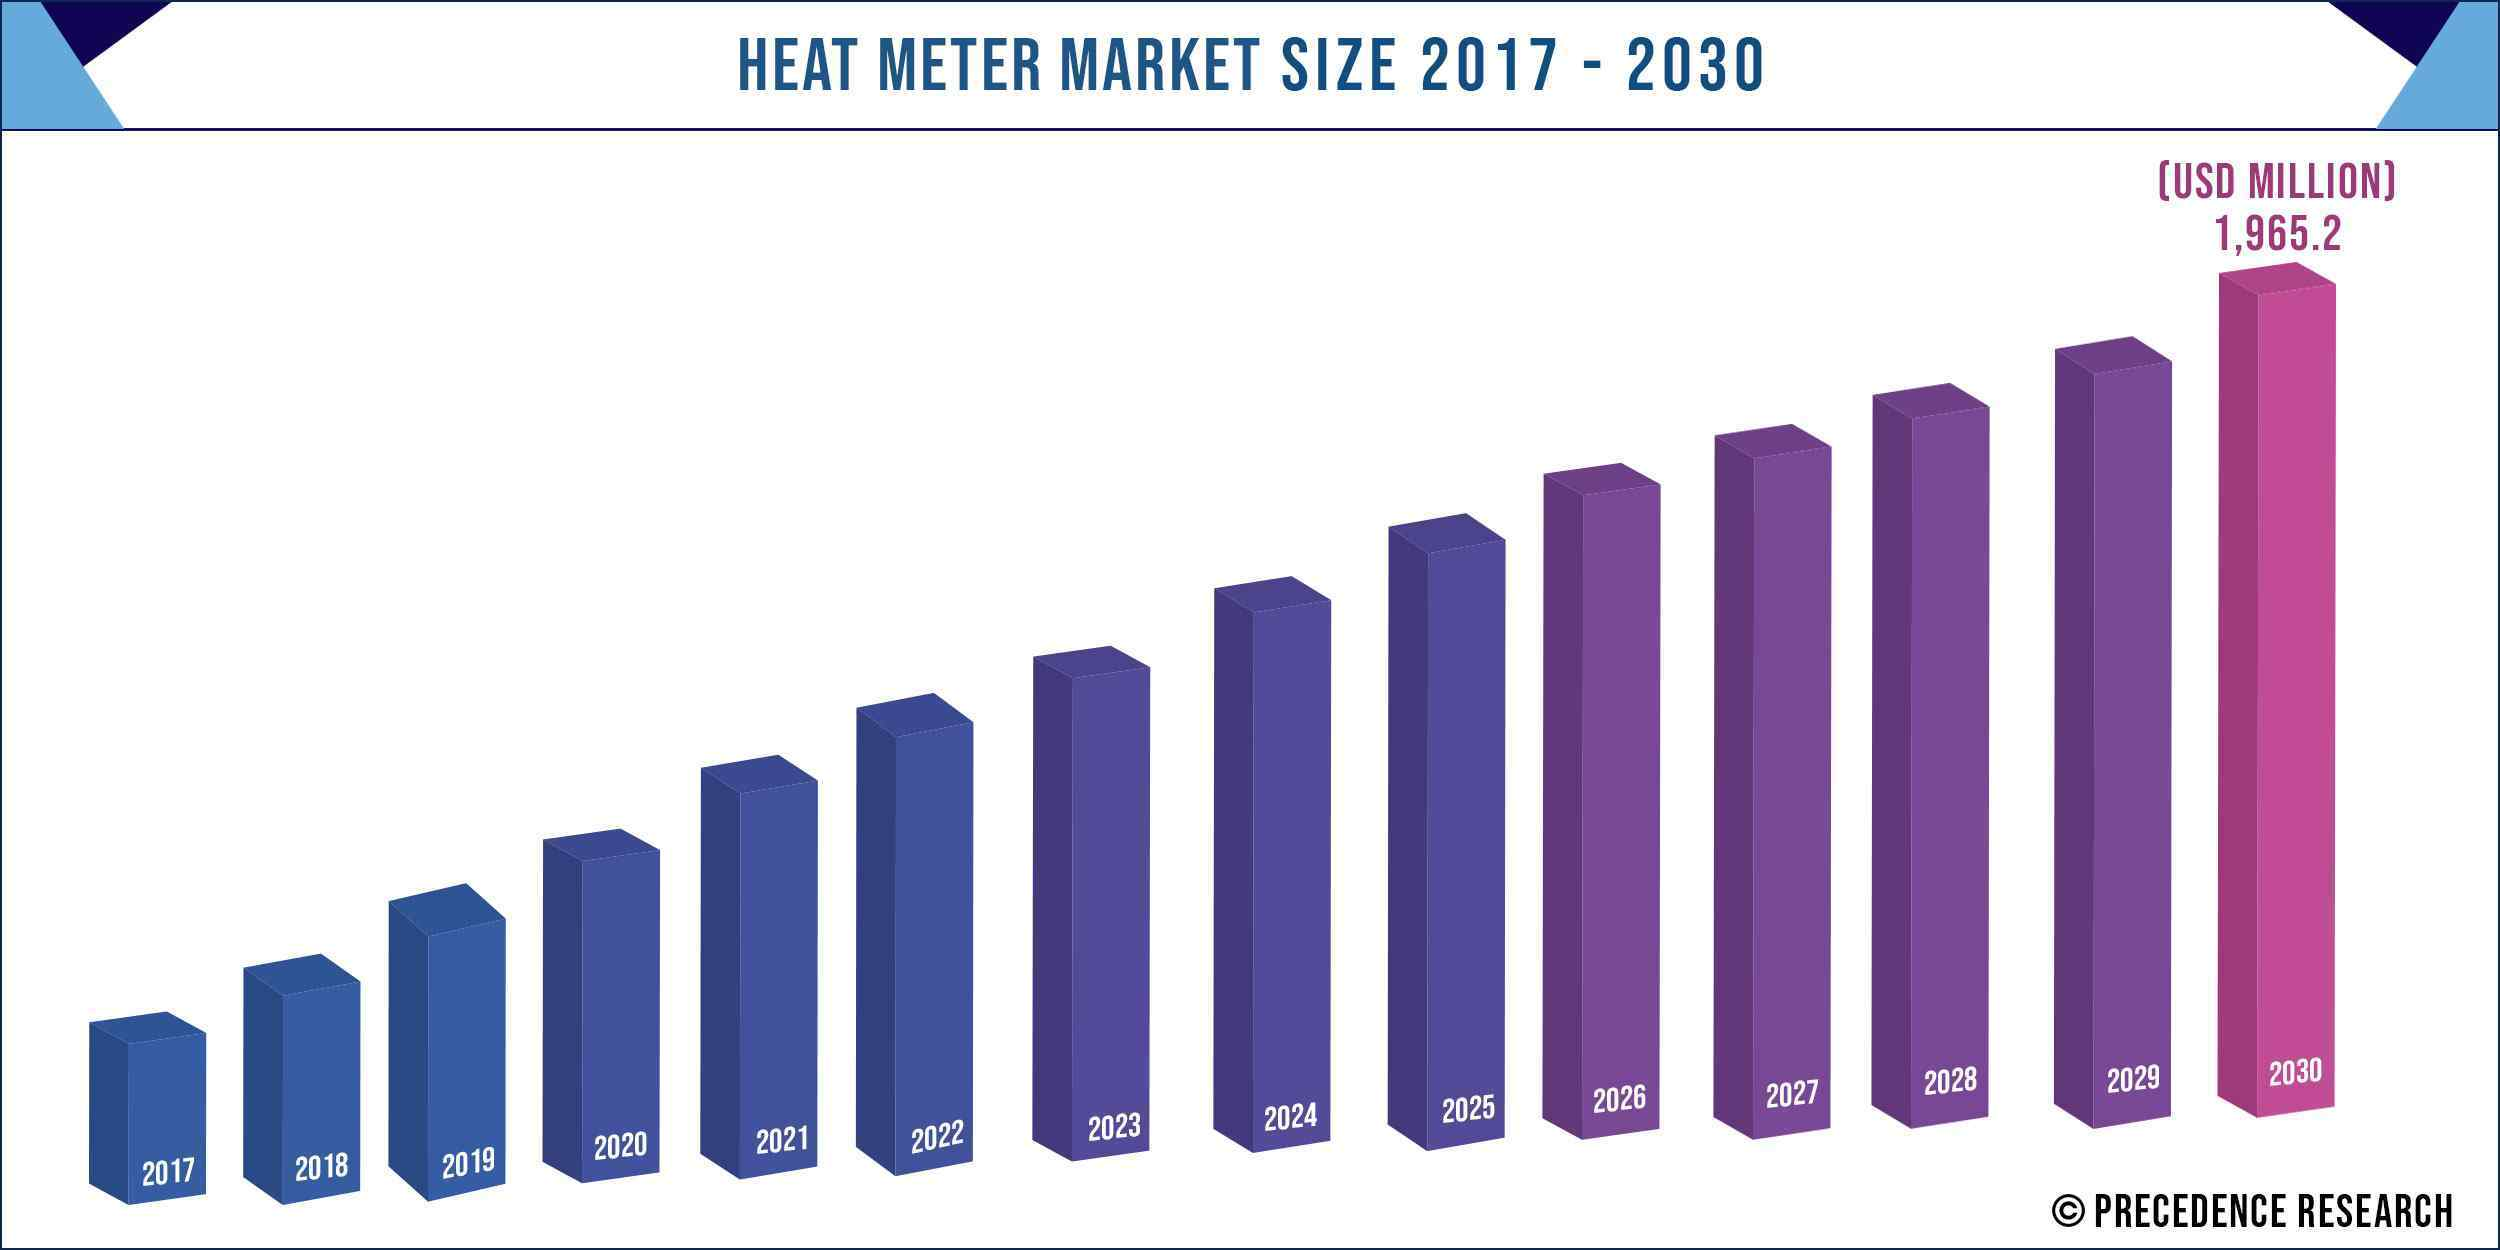 Heat Meter Market Size 2017-2030